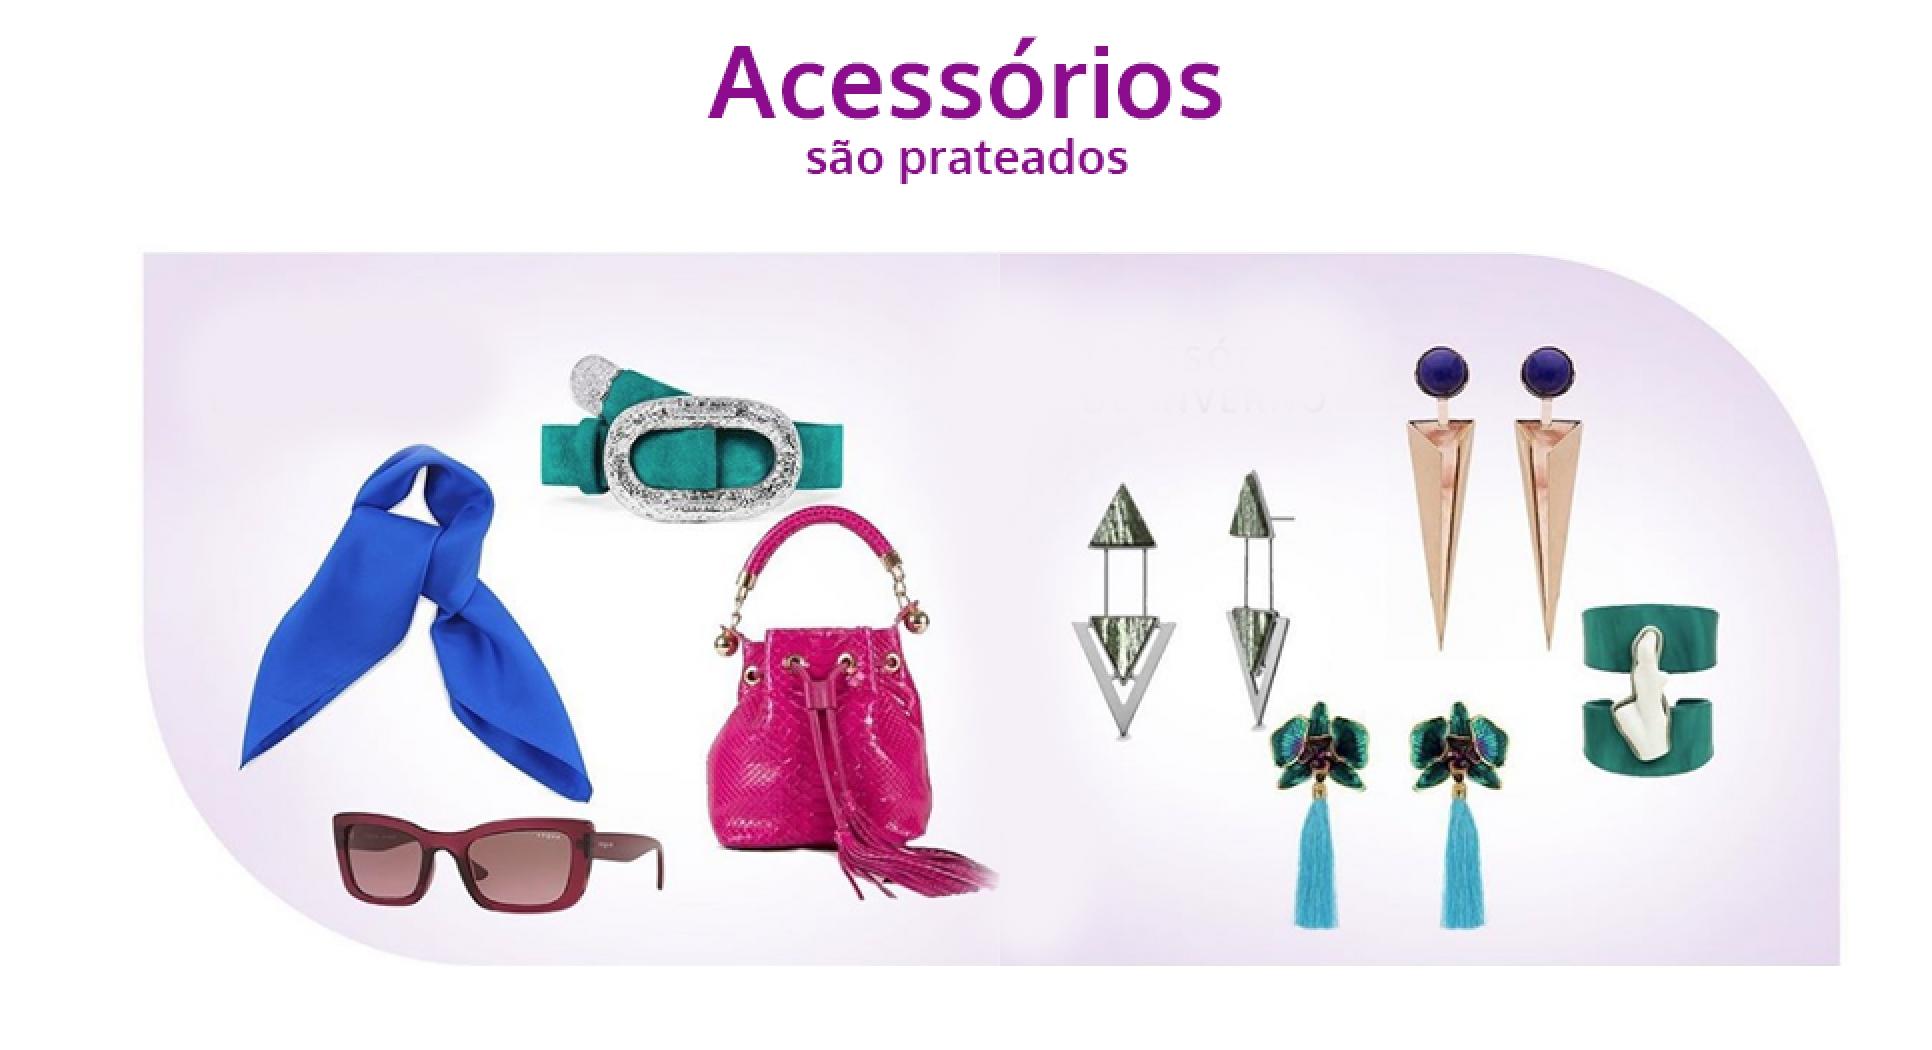 Acessorios png